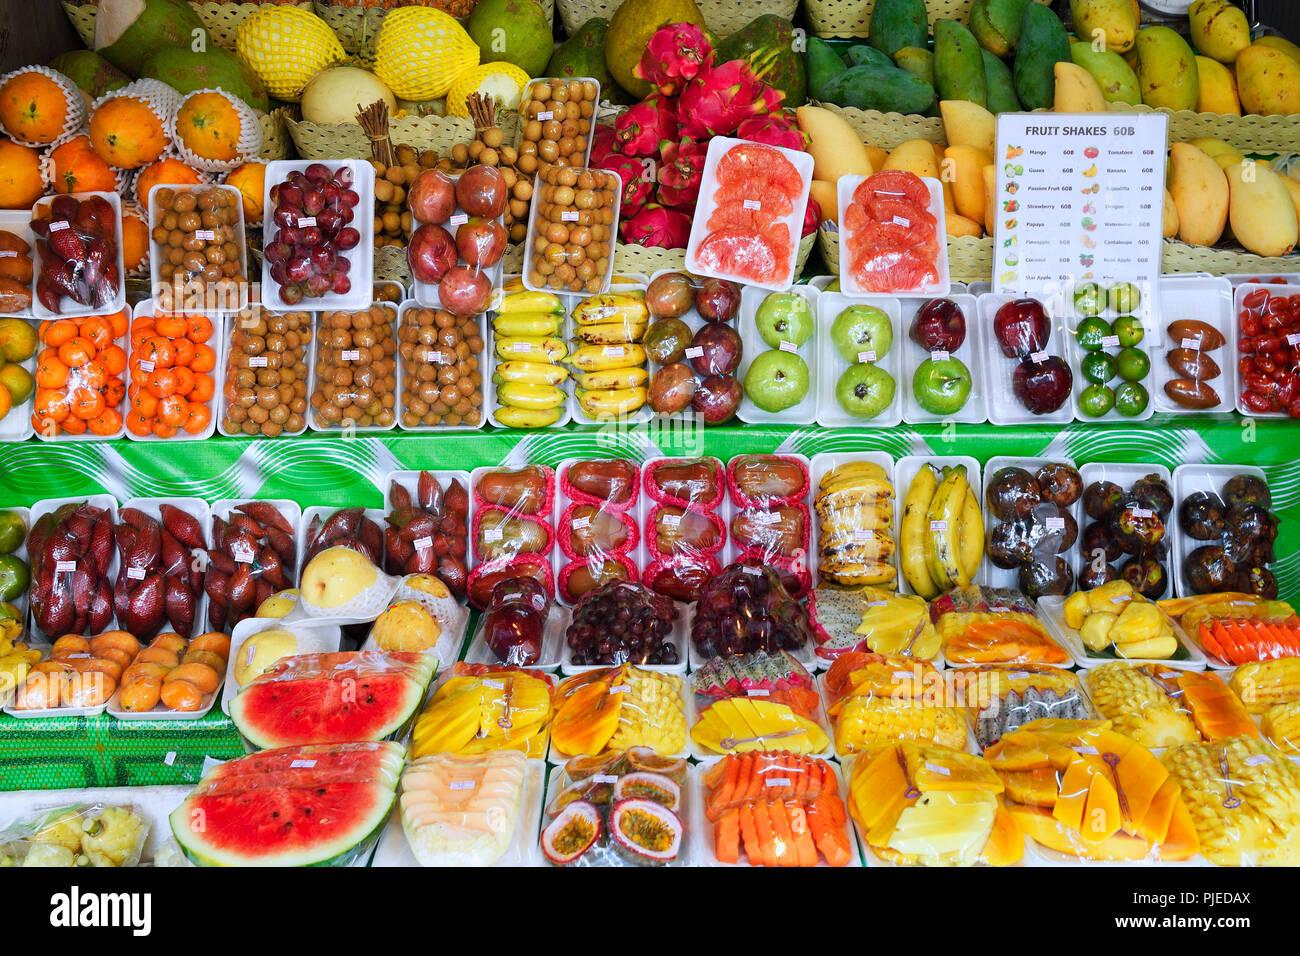 much fresh fruit in a street state, Patong Beach, Phuket, Thailand, viel frisches Obst an einem Straßenstand,  Patong Beach - Stock Image